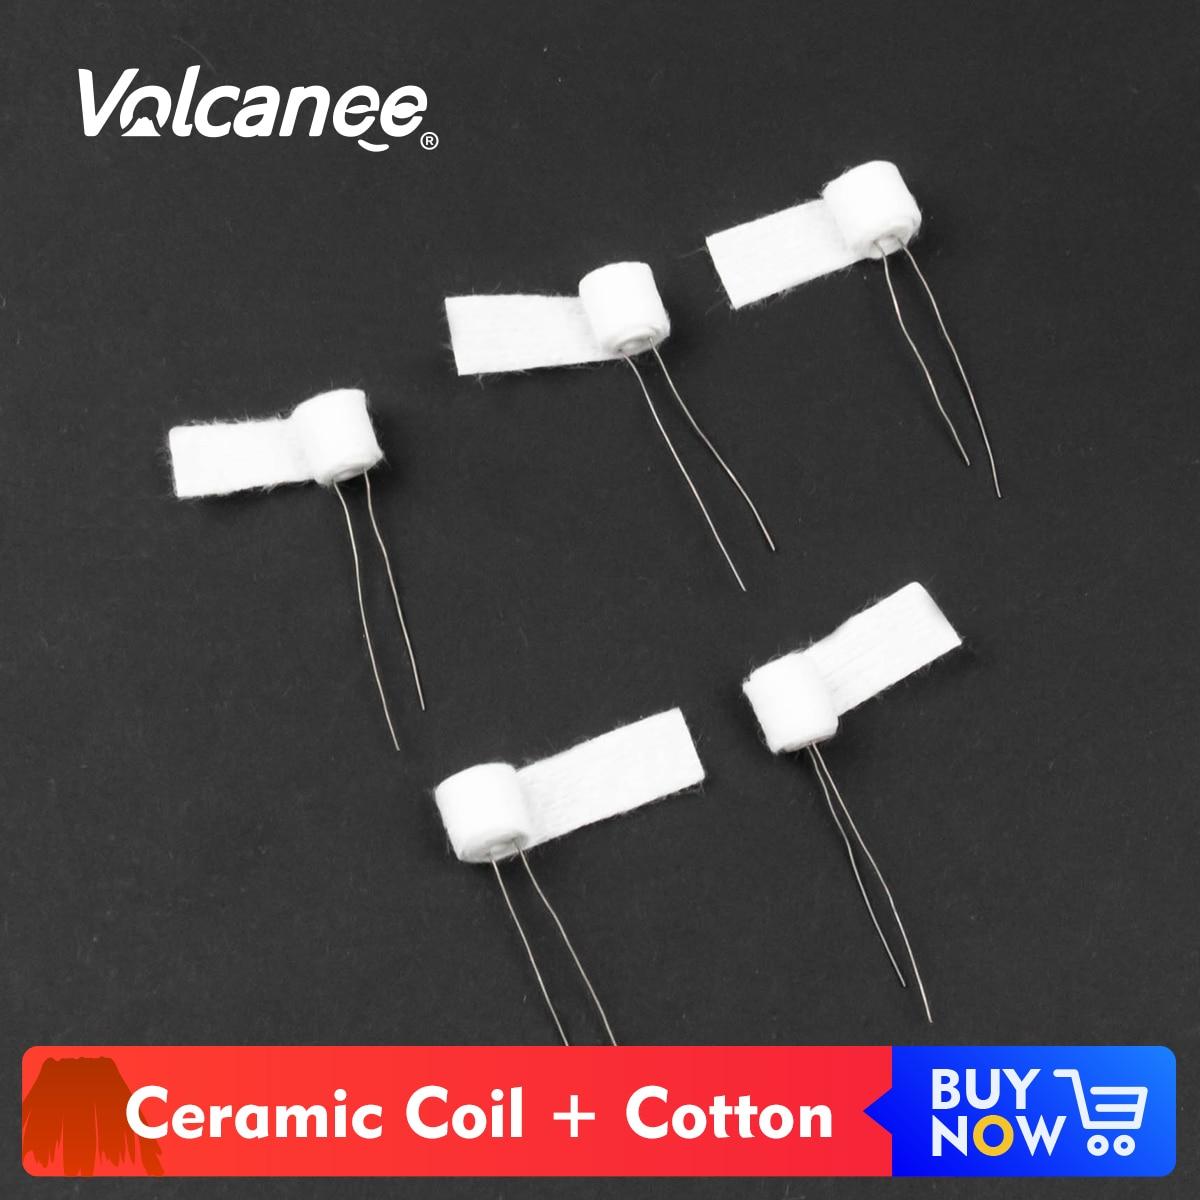 Volcanee Premade Ceramic Coil Cotton Sliver 1.0ohm 1.2ohm Oil-Absorbing For CBD Vape Cartridge DIY ECig Ceramic Heating Wire